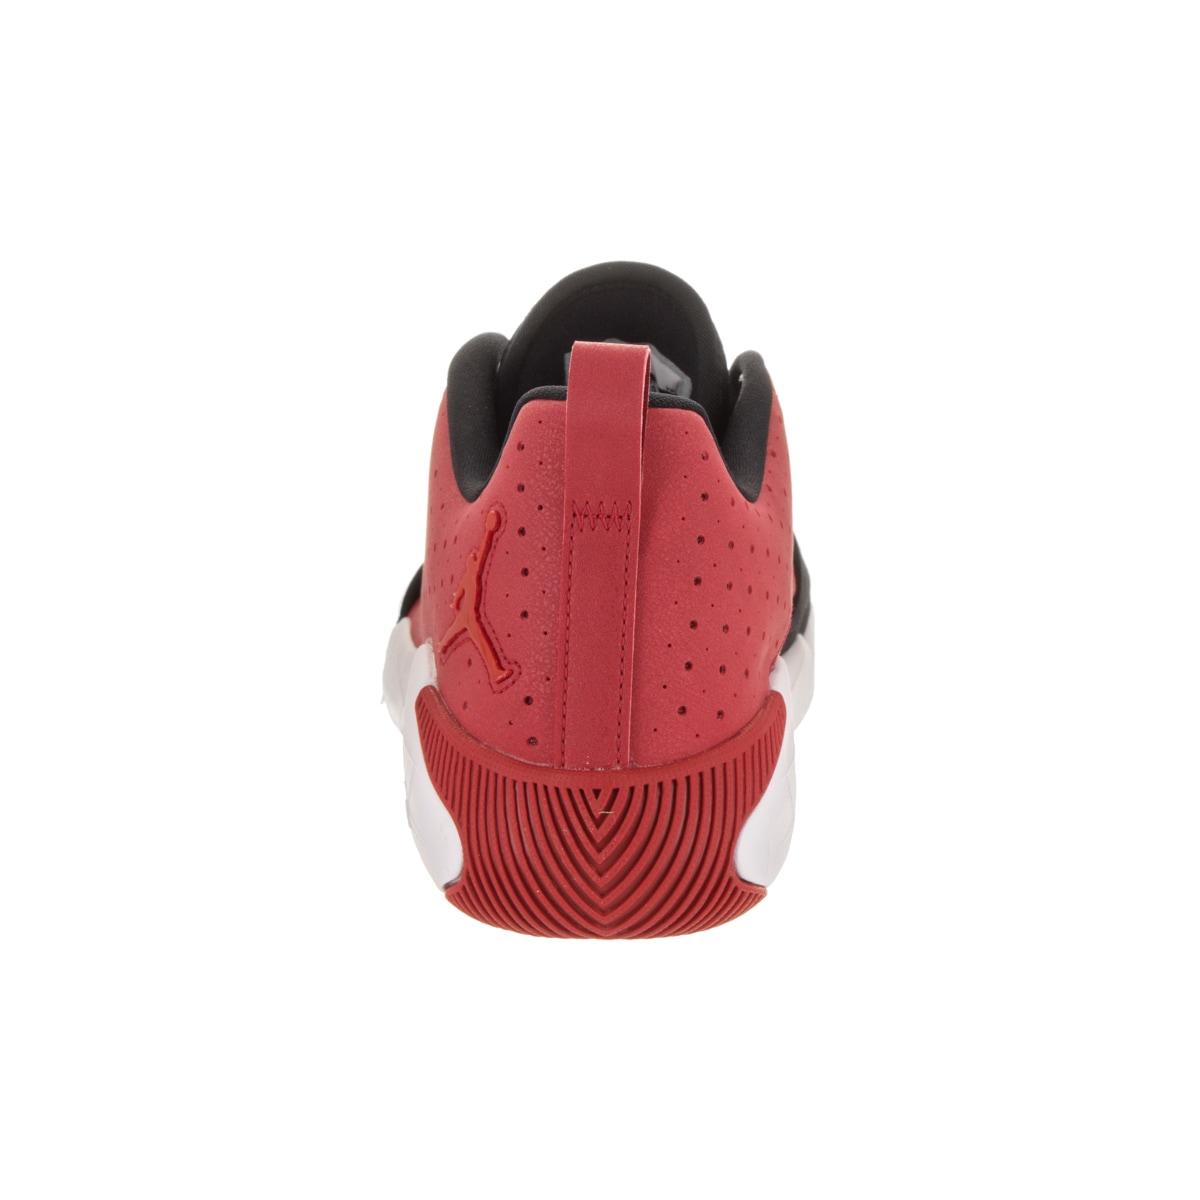 cheap for discount af750 e0aa5 Shop Nike Jordan Men s Air Jordan 23 Breakout Basketball Shoe - Free  Shipping Today - Overstock - 14676682